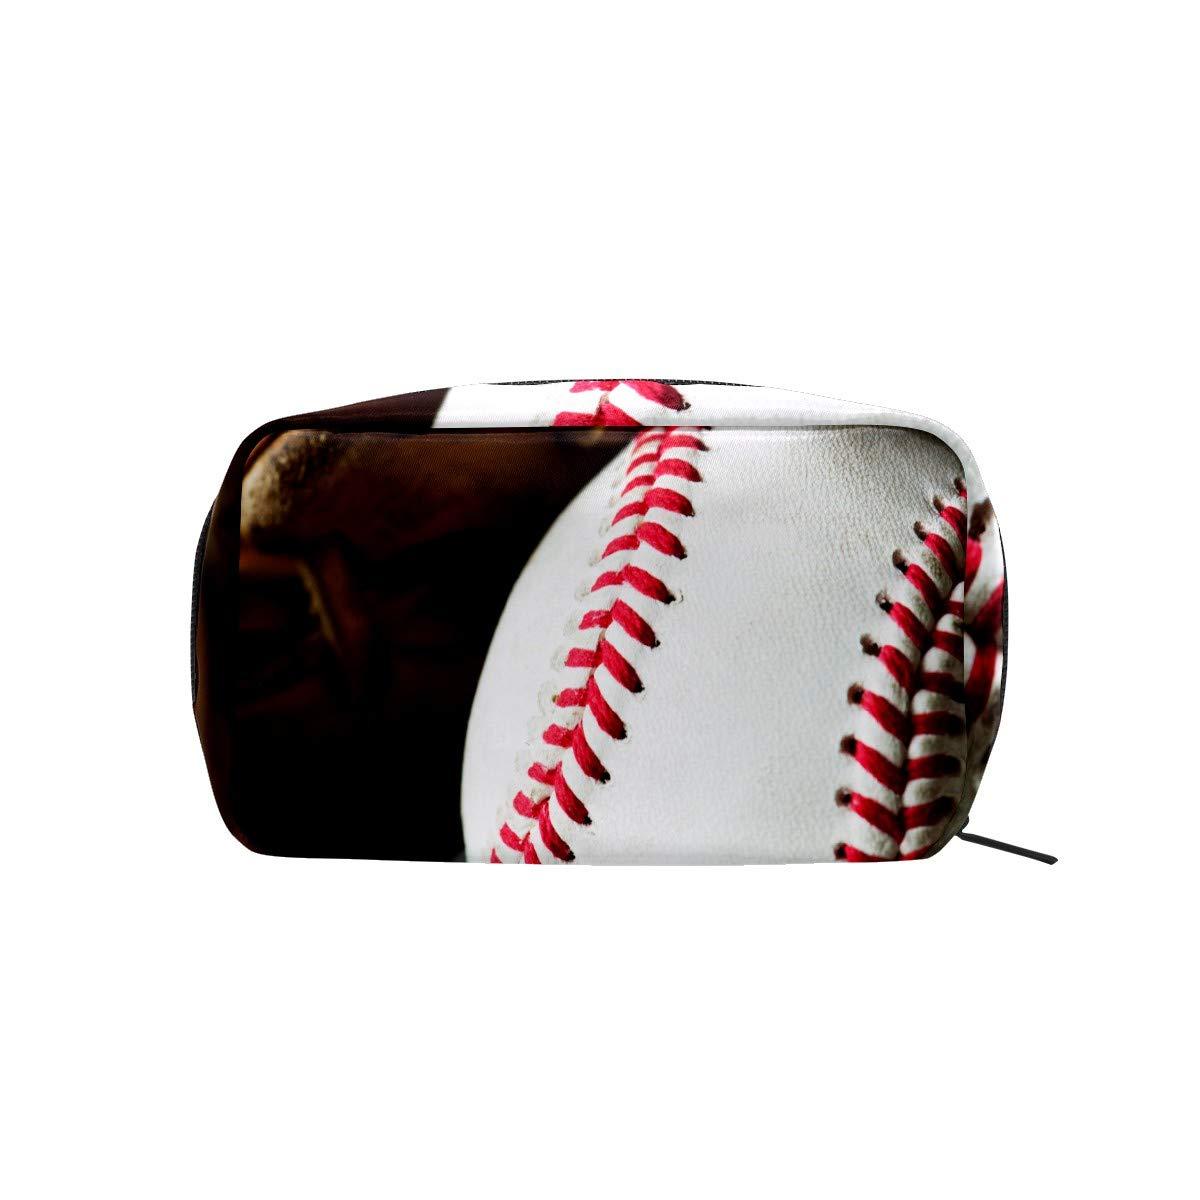 Women Makeup Bags,Cosmetic Organizer Storage Bag for Girls Female,Portable Travel Toiletry Pouch Beauty Handbag Zipper Purse Baseball Ball